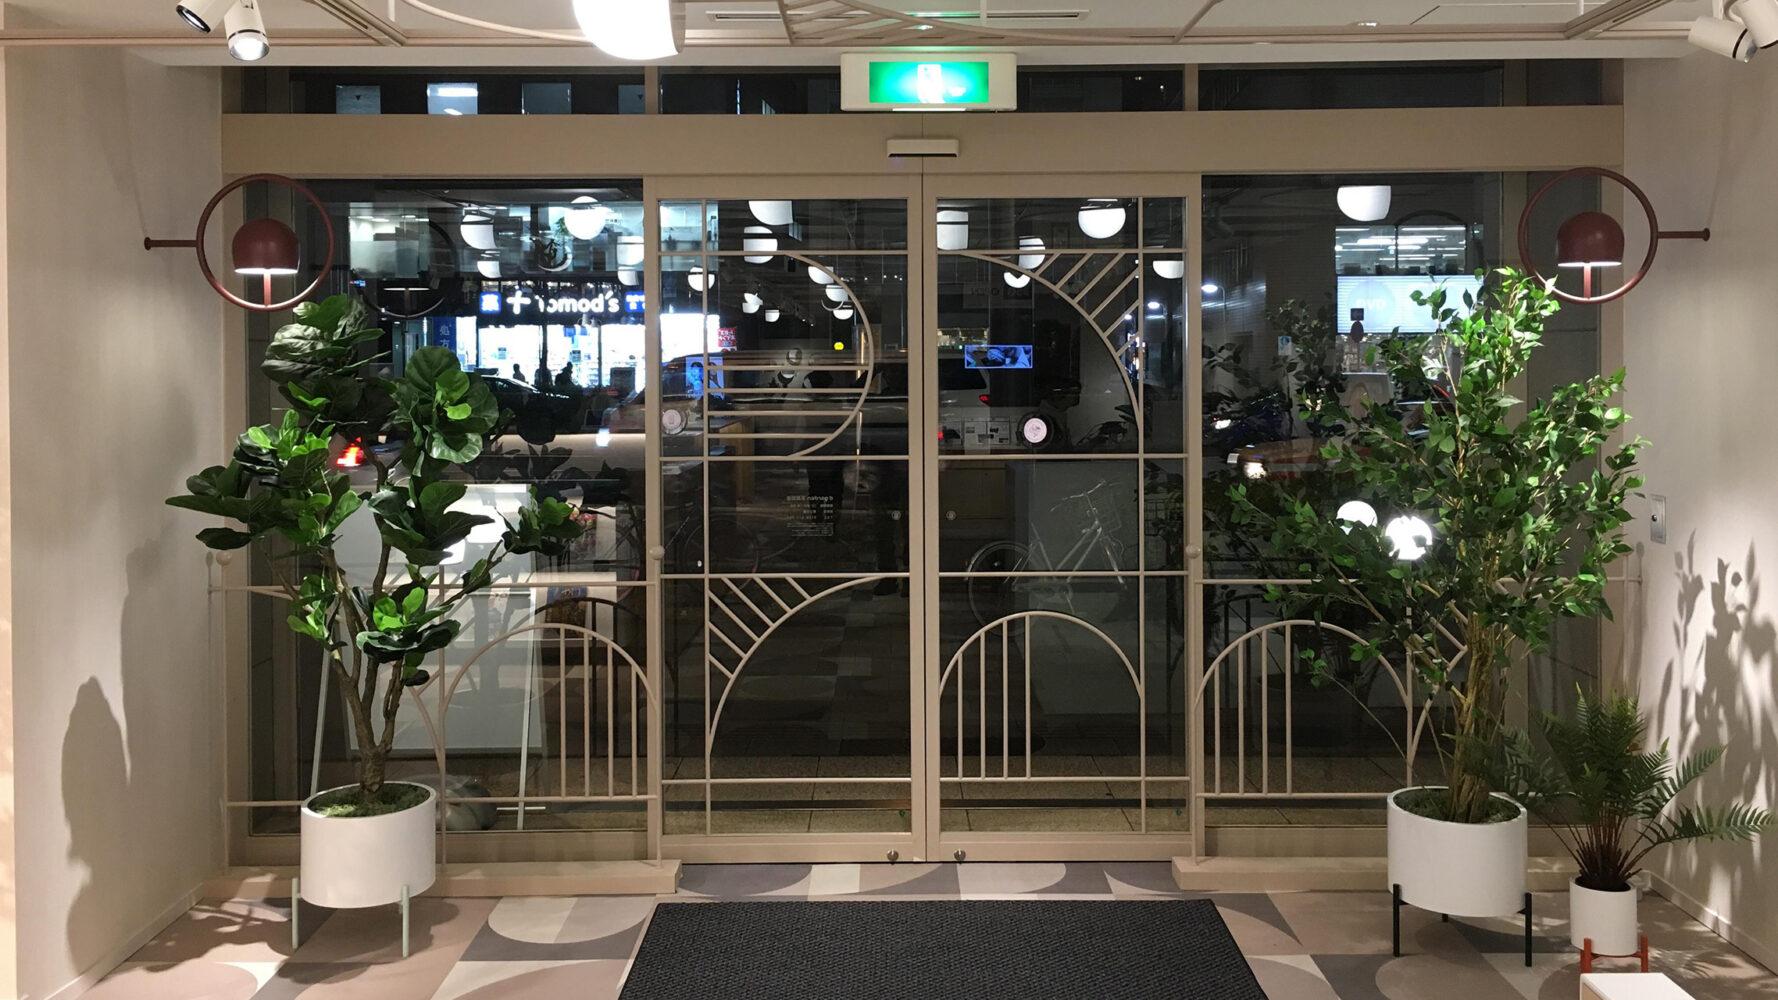 d garden 五反田店 事例画像2